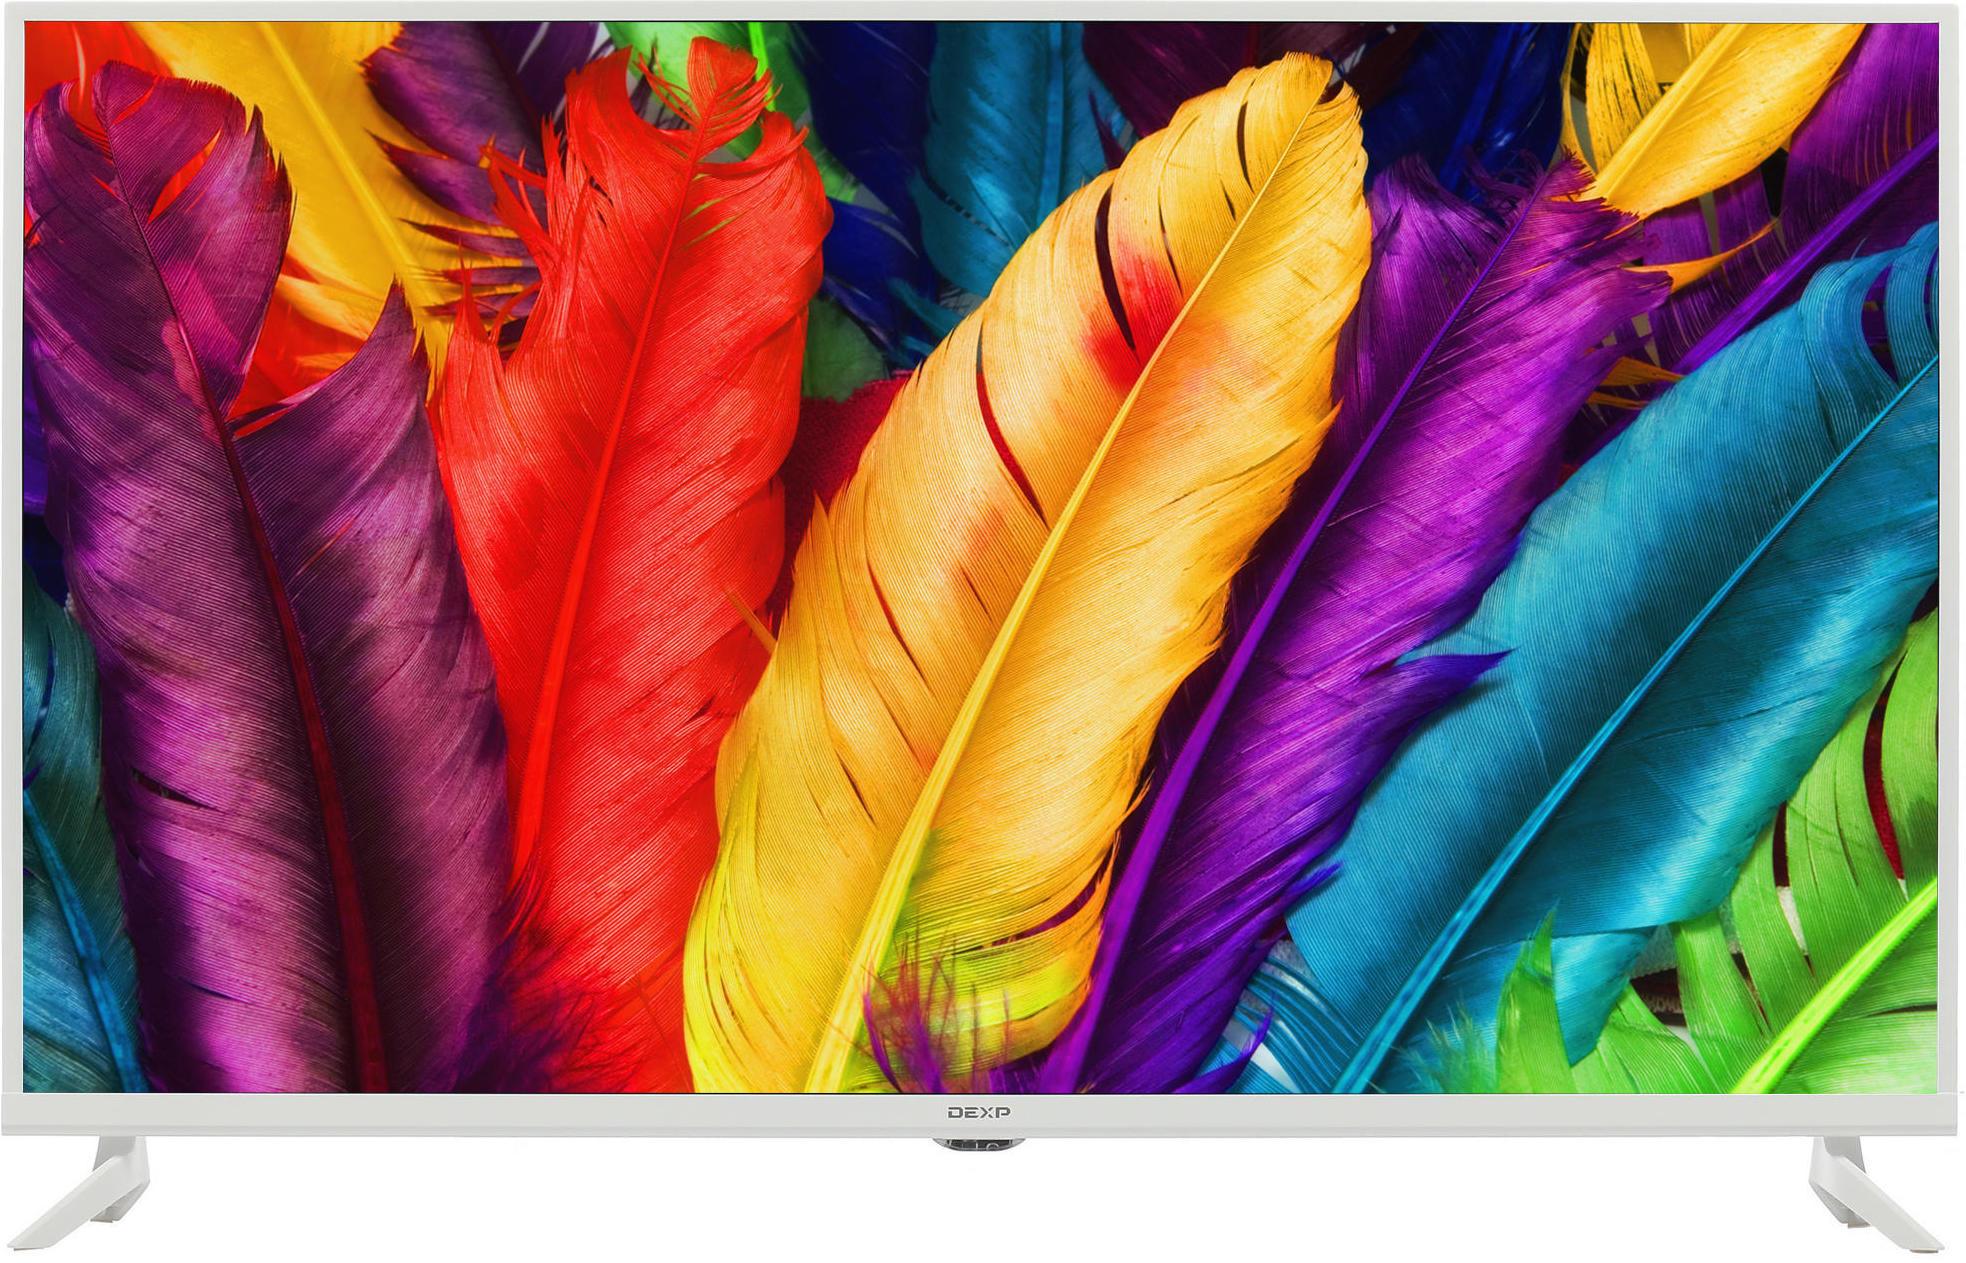 Телевизор Dexp F32D7200C/W